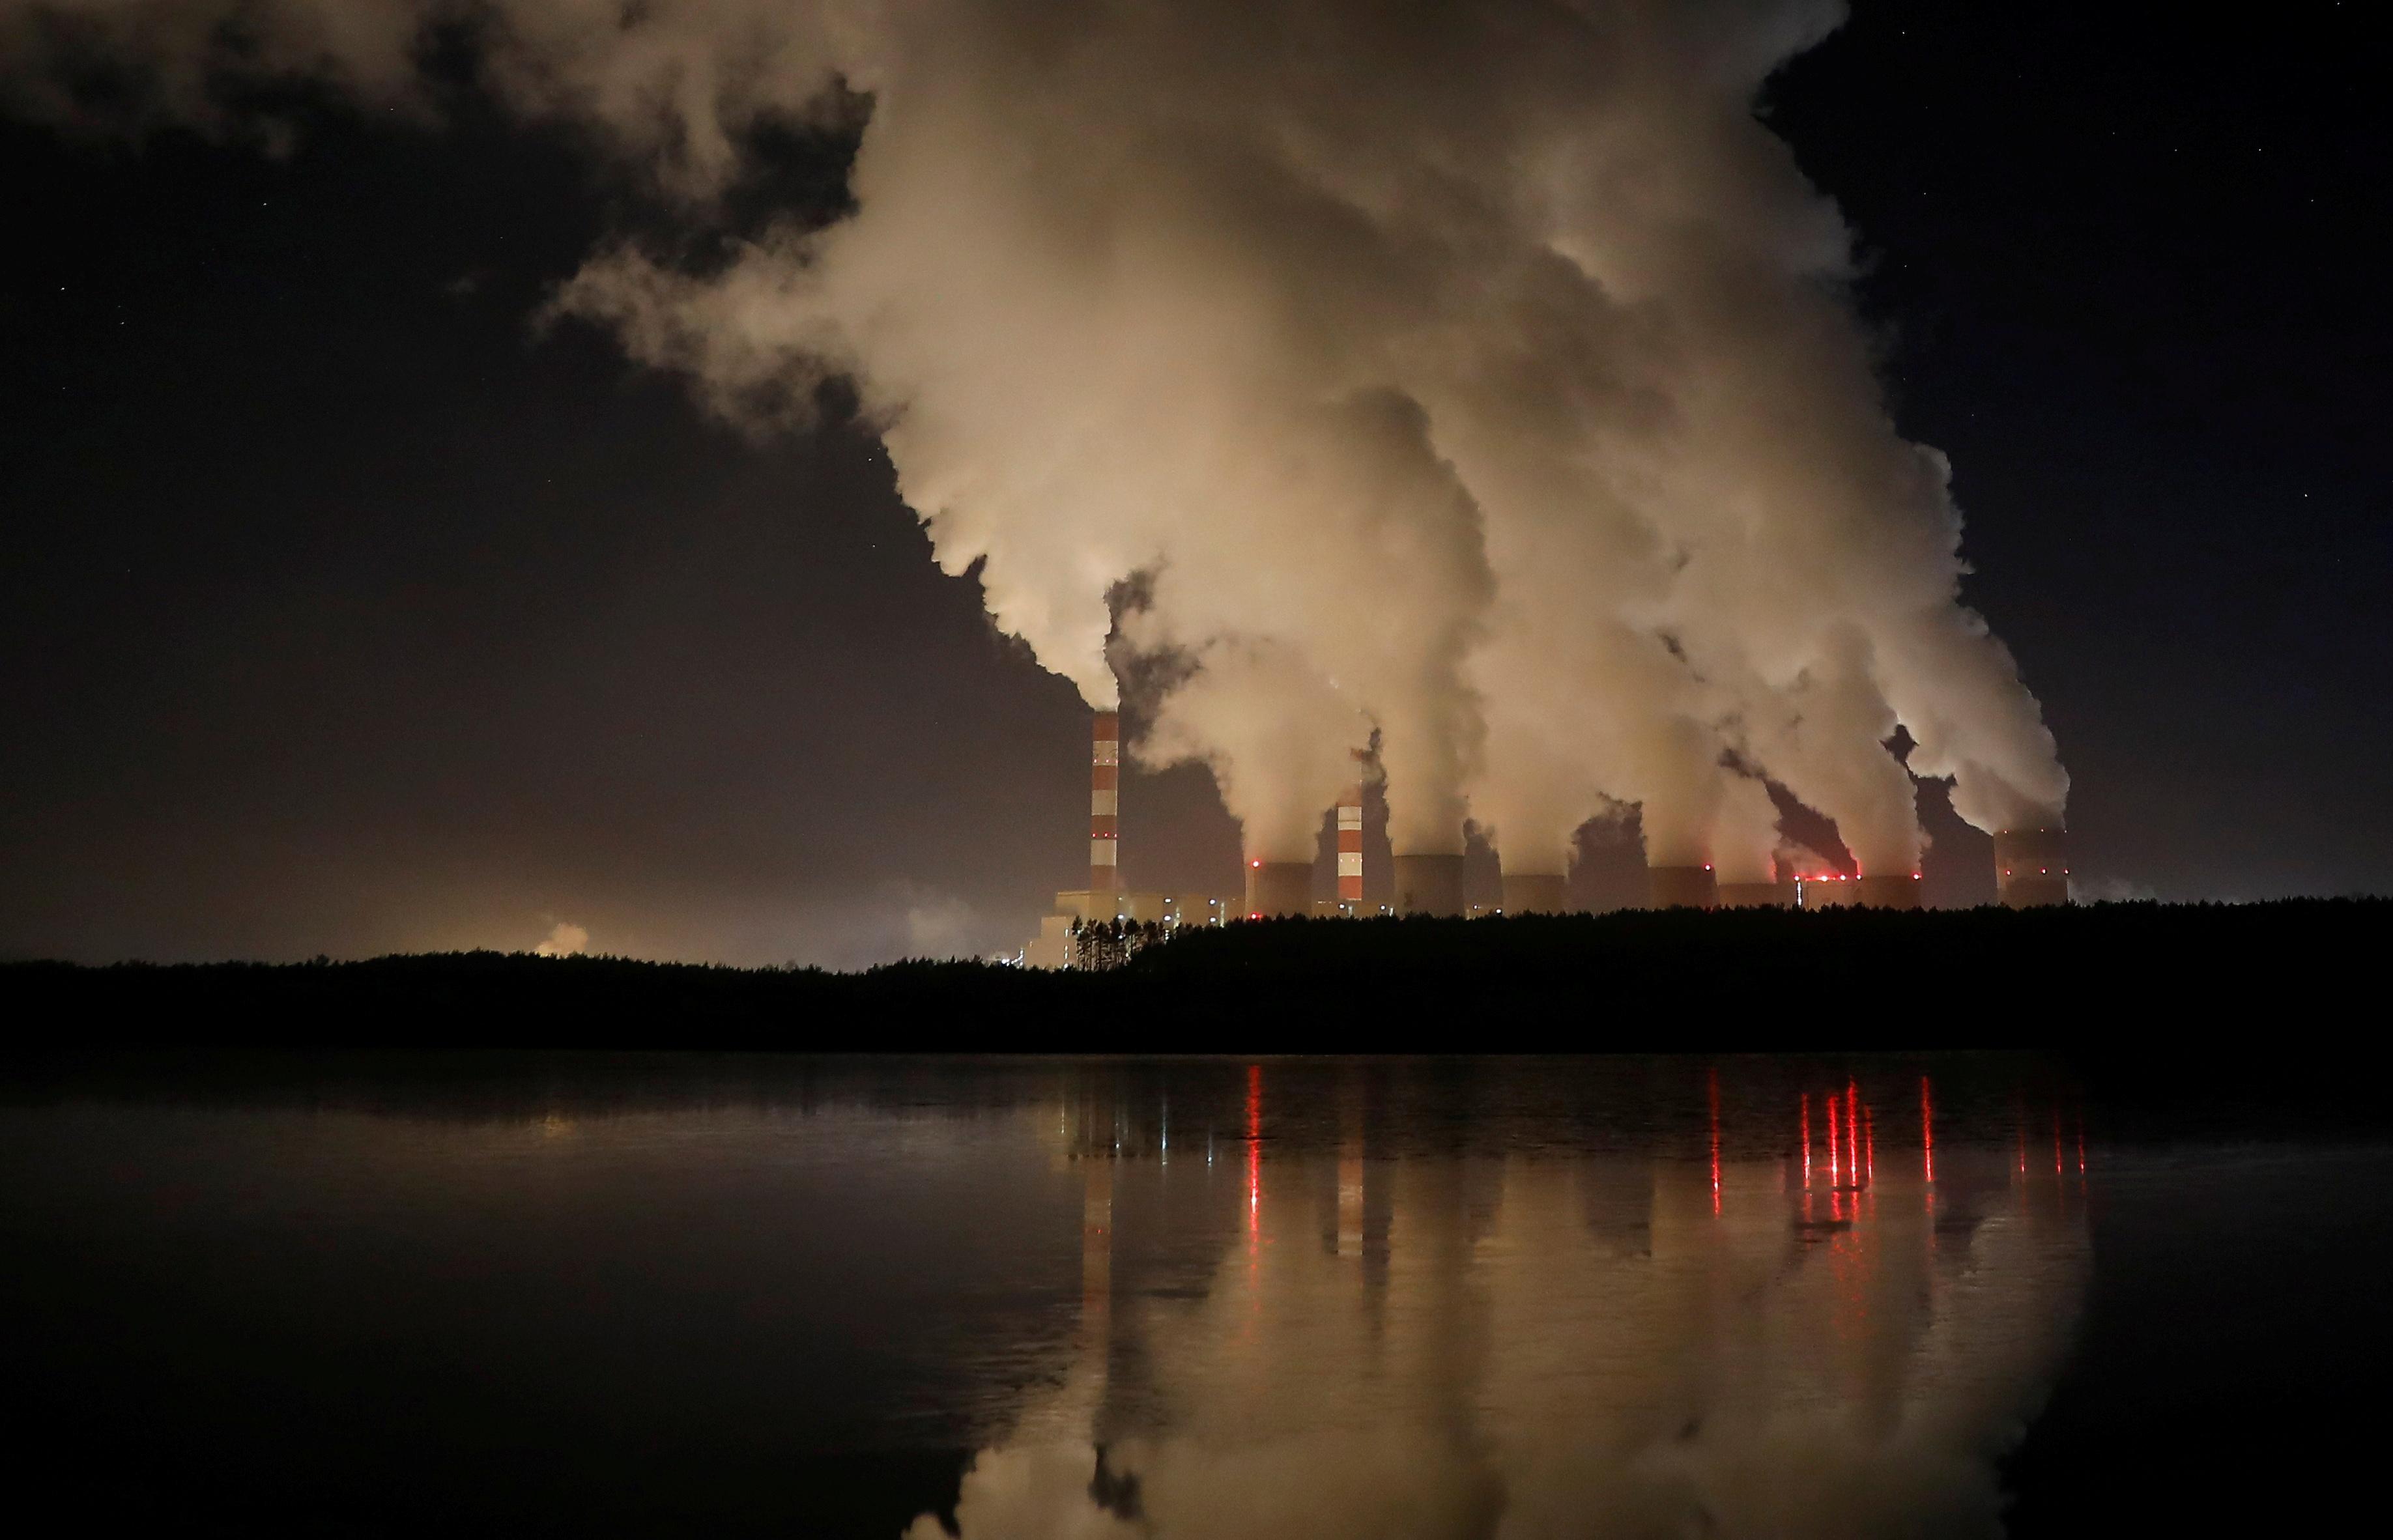 European Union Proposes An Extensive Climate Action Plan